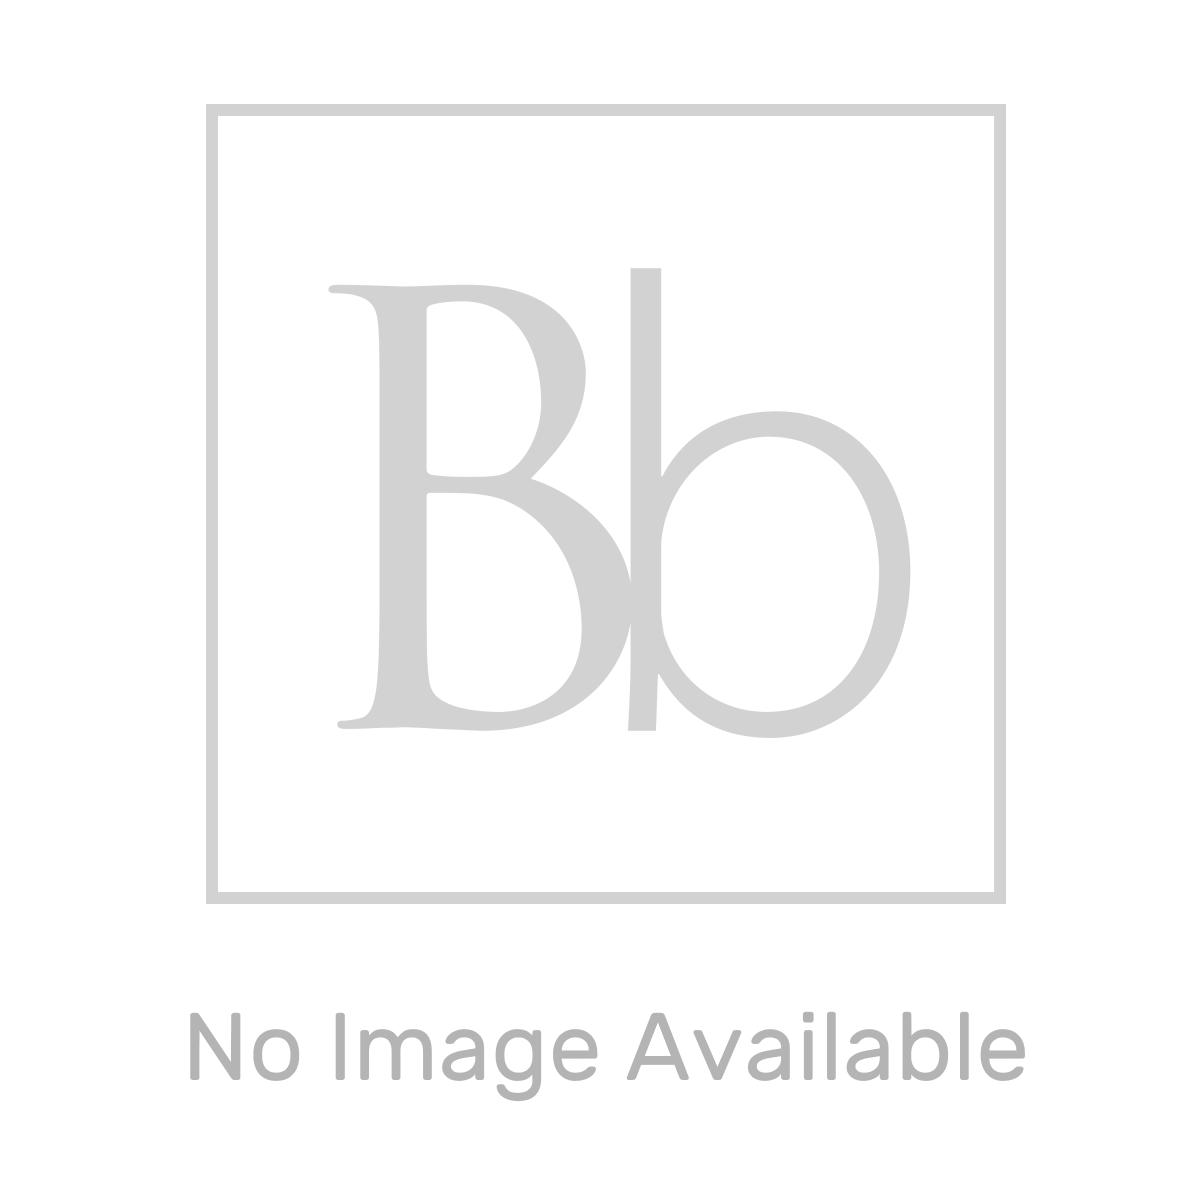 RAK Series 600 Close Coupled Toilet and 400 Series Gloss White Mini Vanity Unit Drawing